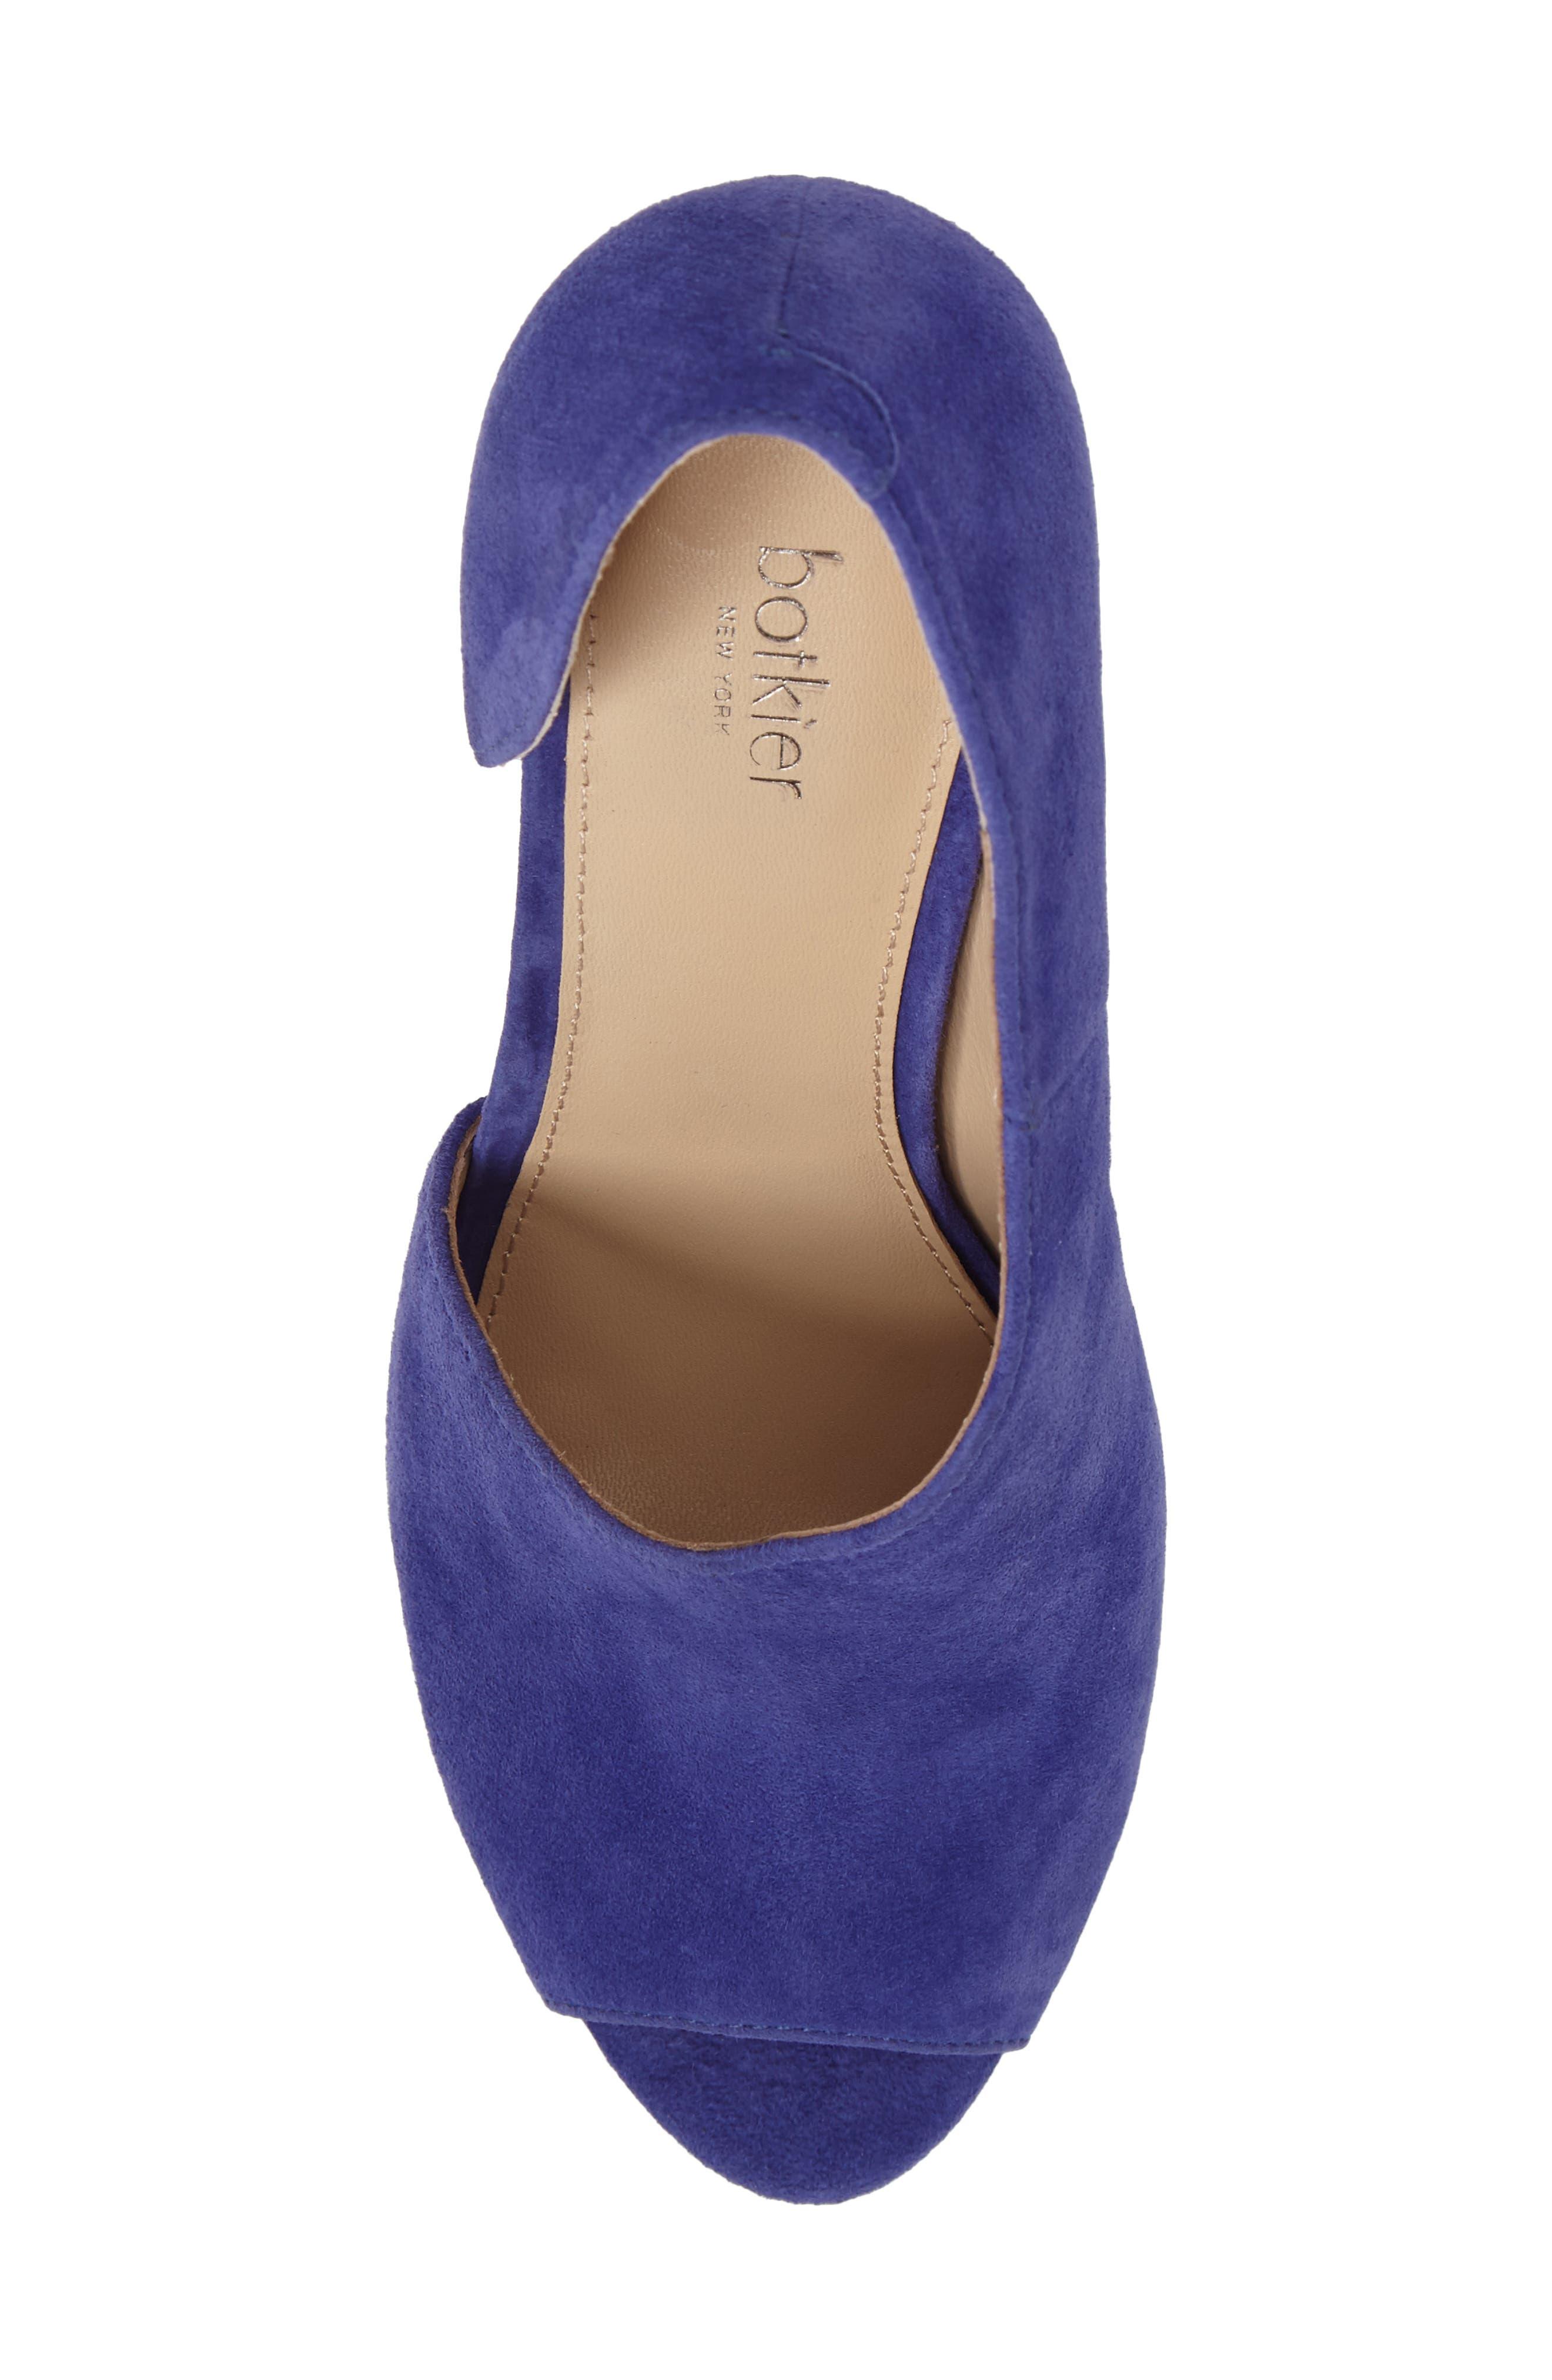 Adelia Asymmetrical Sandal,                             Alternate thumbnail 5, color,                             Blue